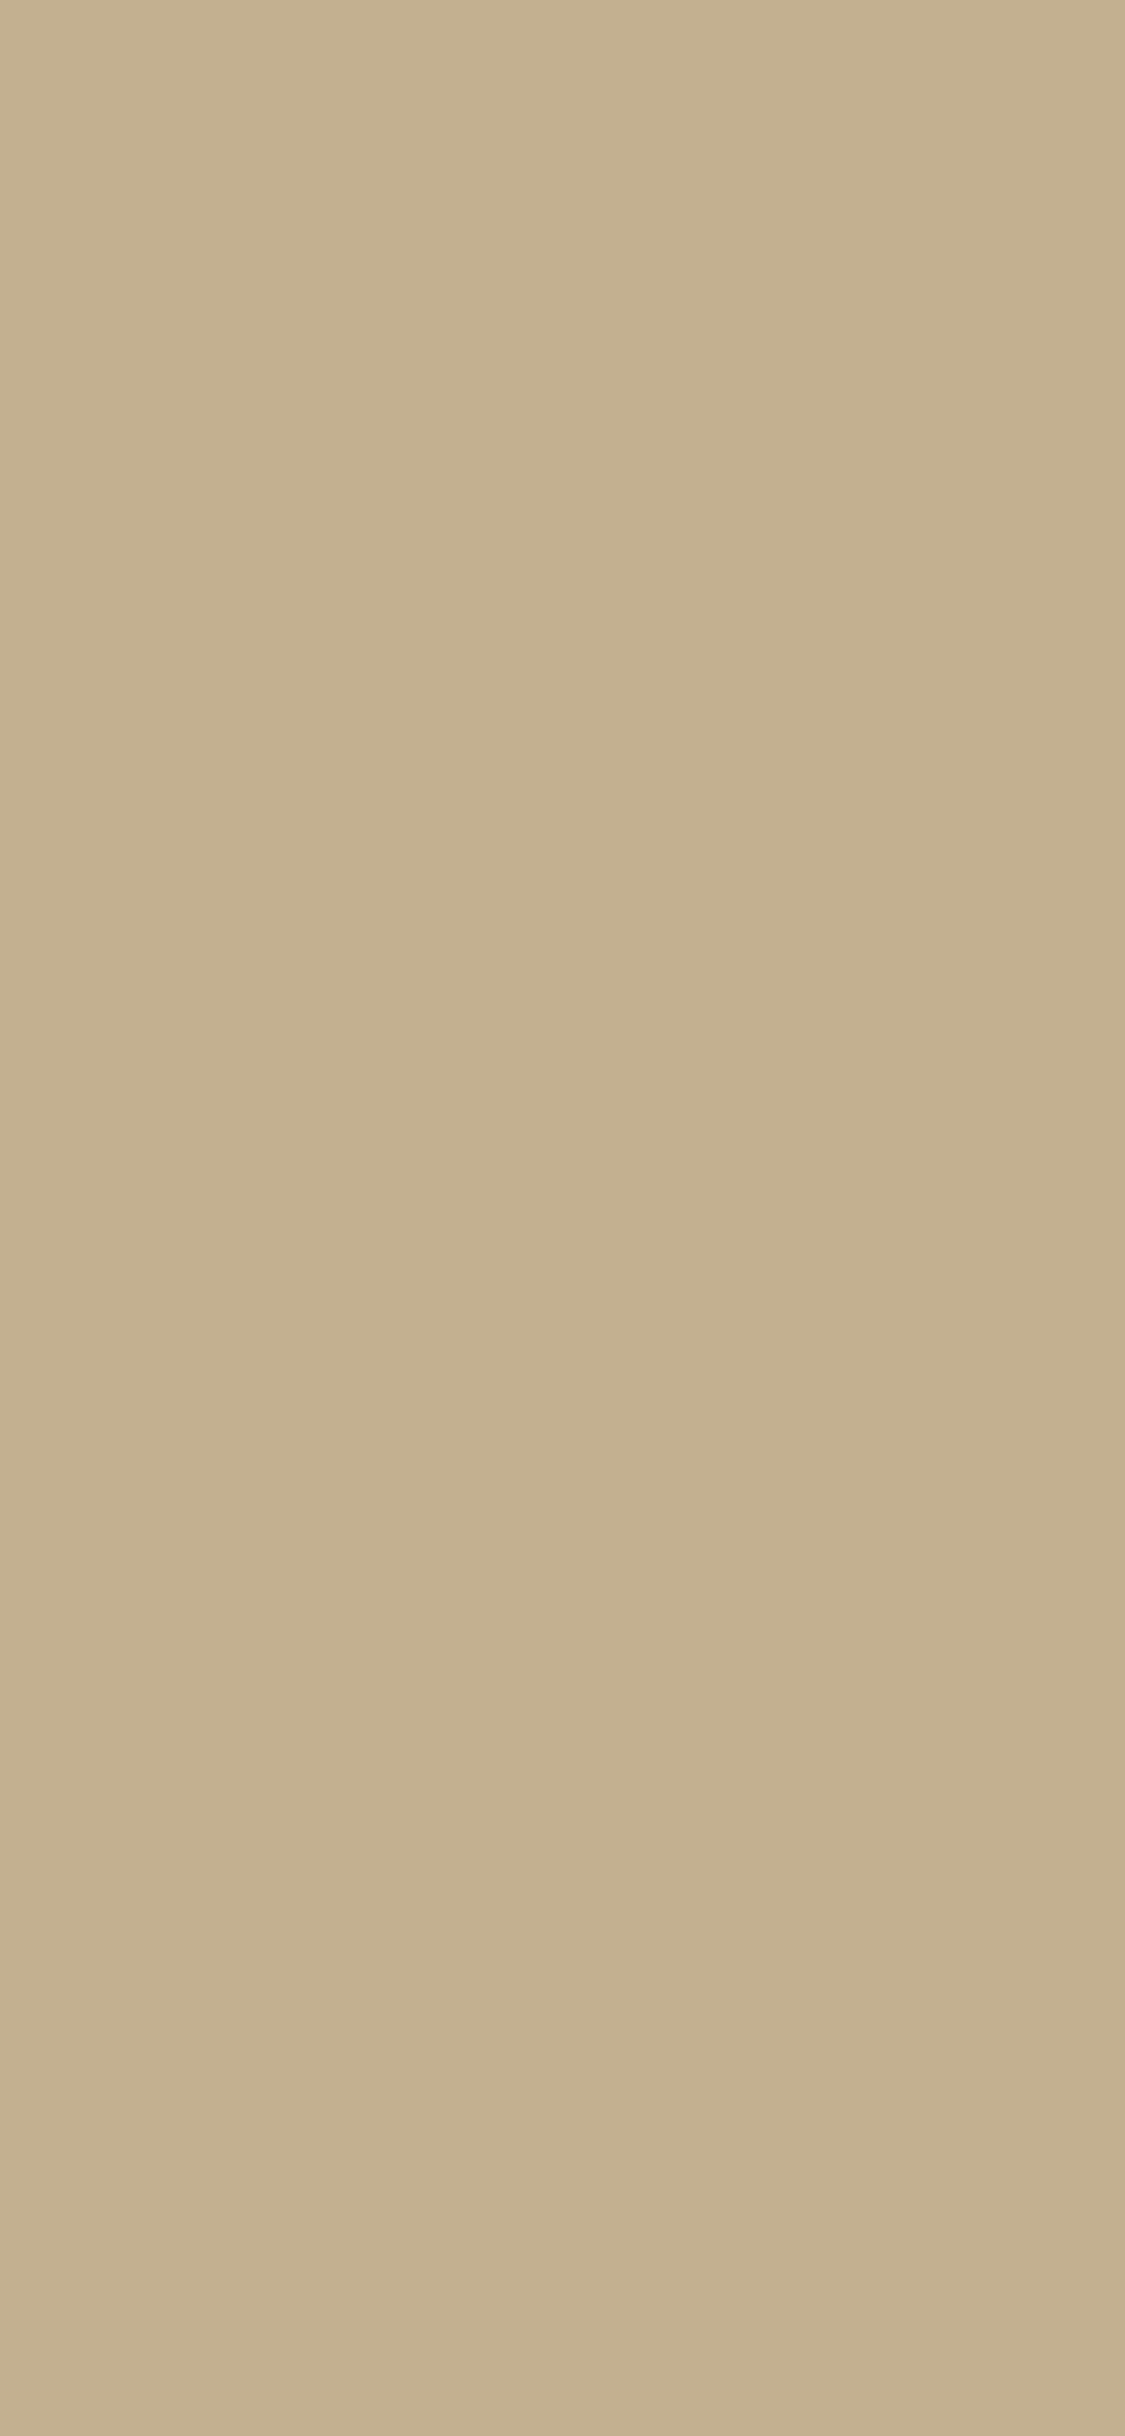 1125x2436 Khaki Web Solid Color Background